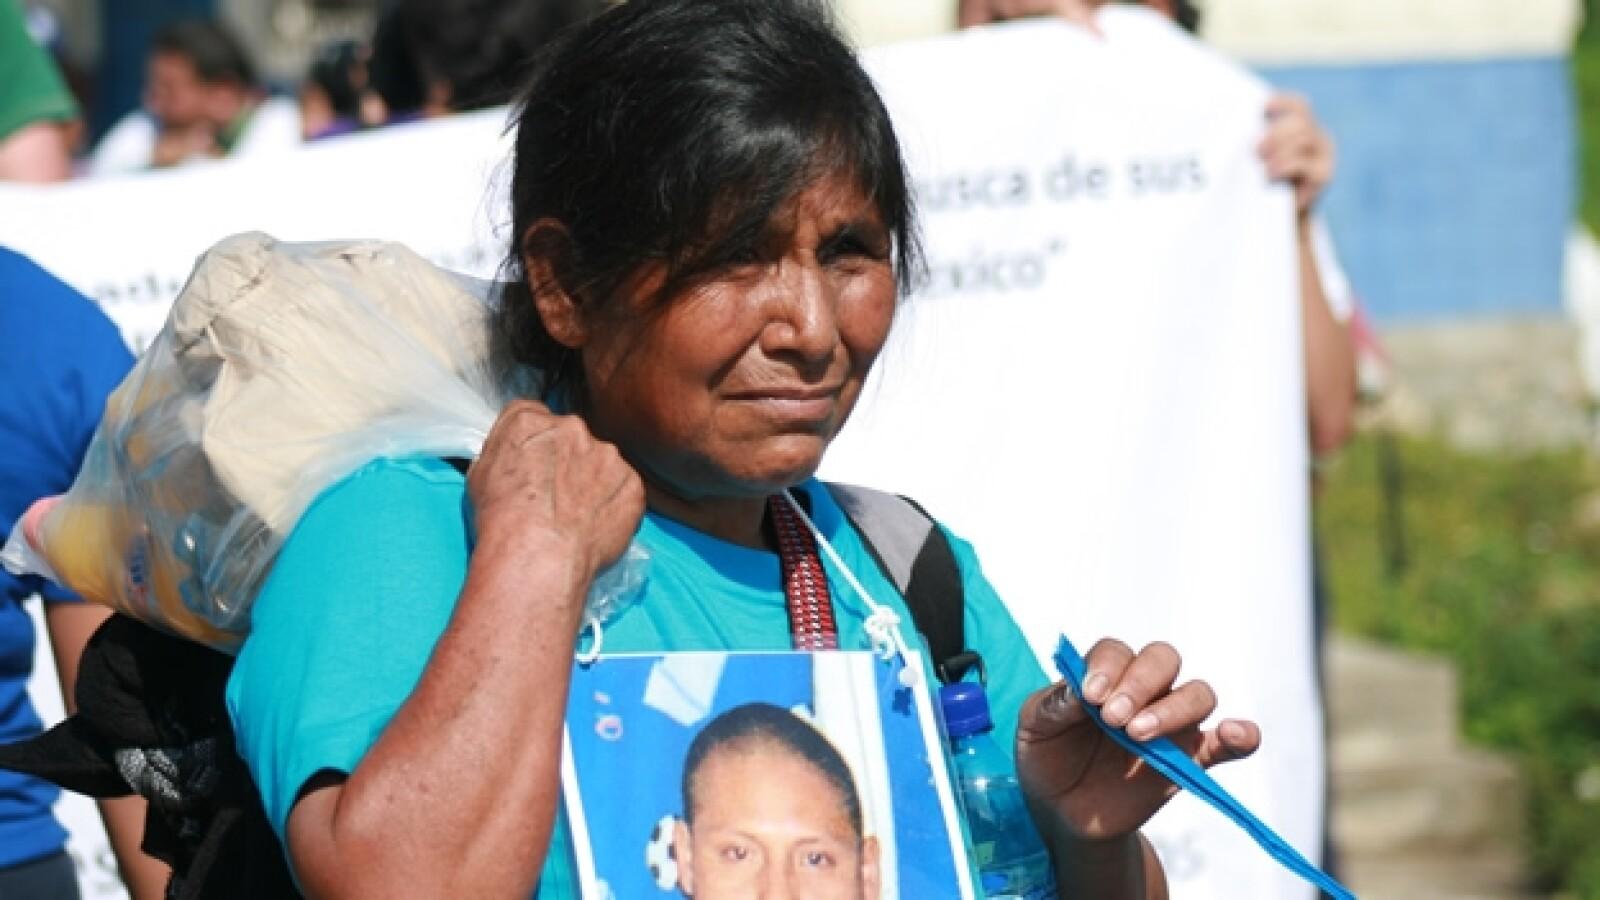 caravana de madres migrantes centroamericanas 2